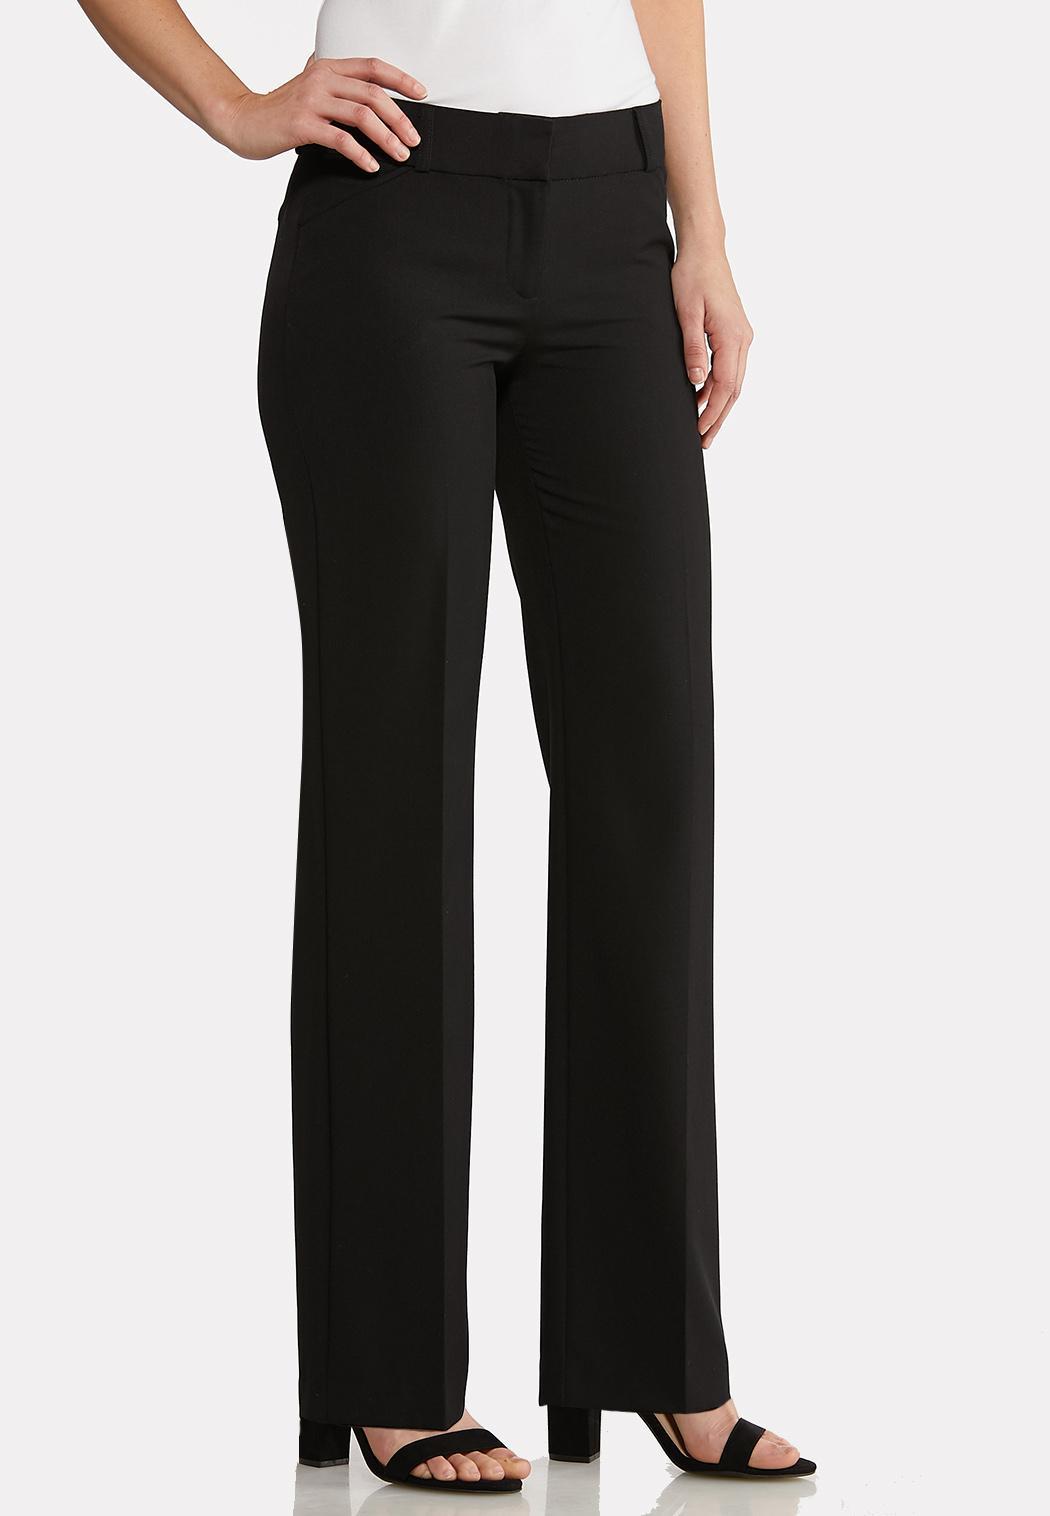 Petite Shape Enhancing Trousers